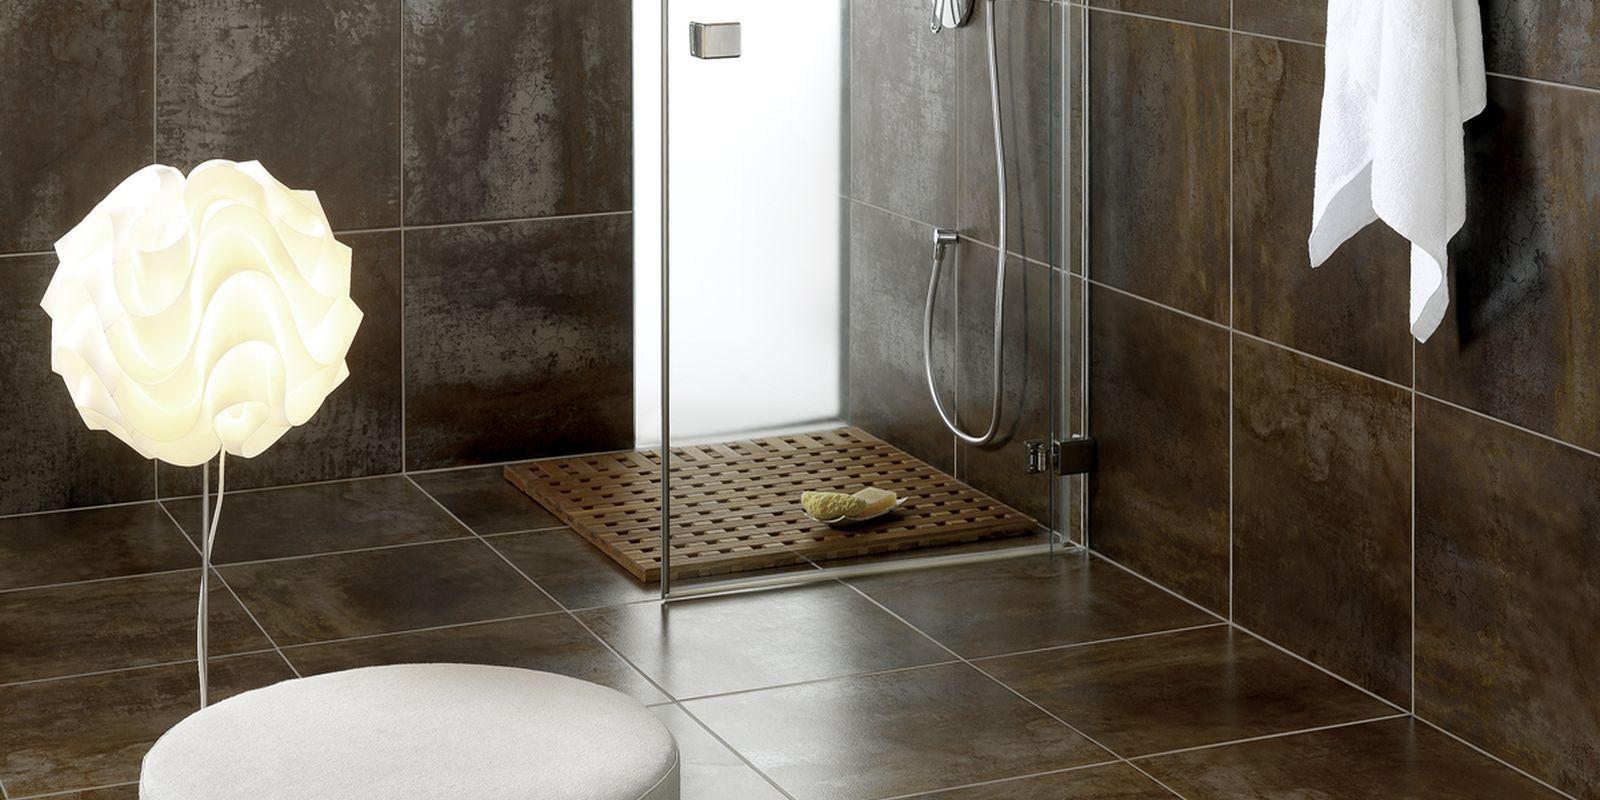 Antares 1 imolaceramica tiles bathroom e porcelain tile - Piastrelle bagno nere ...